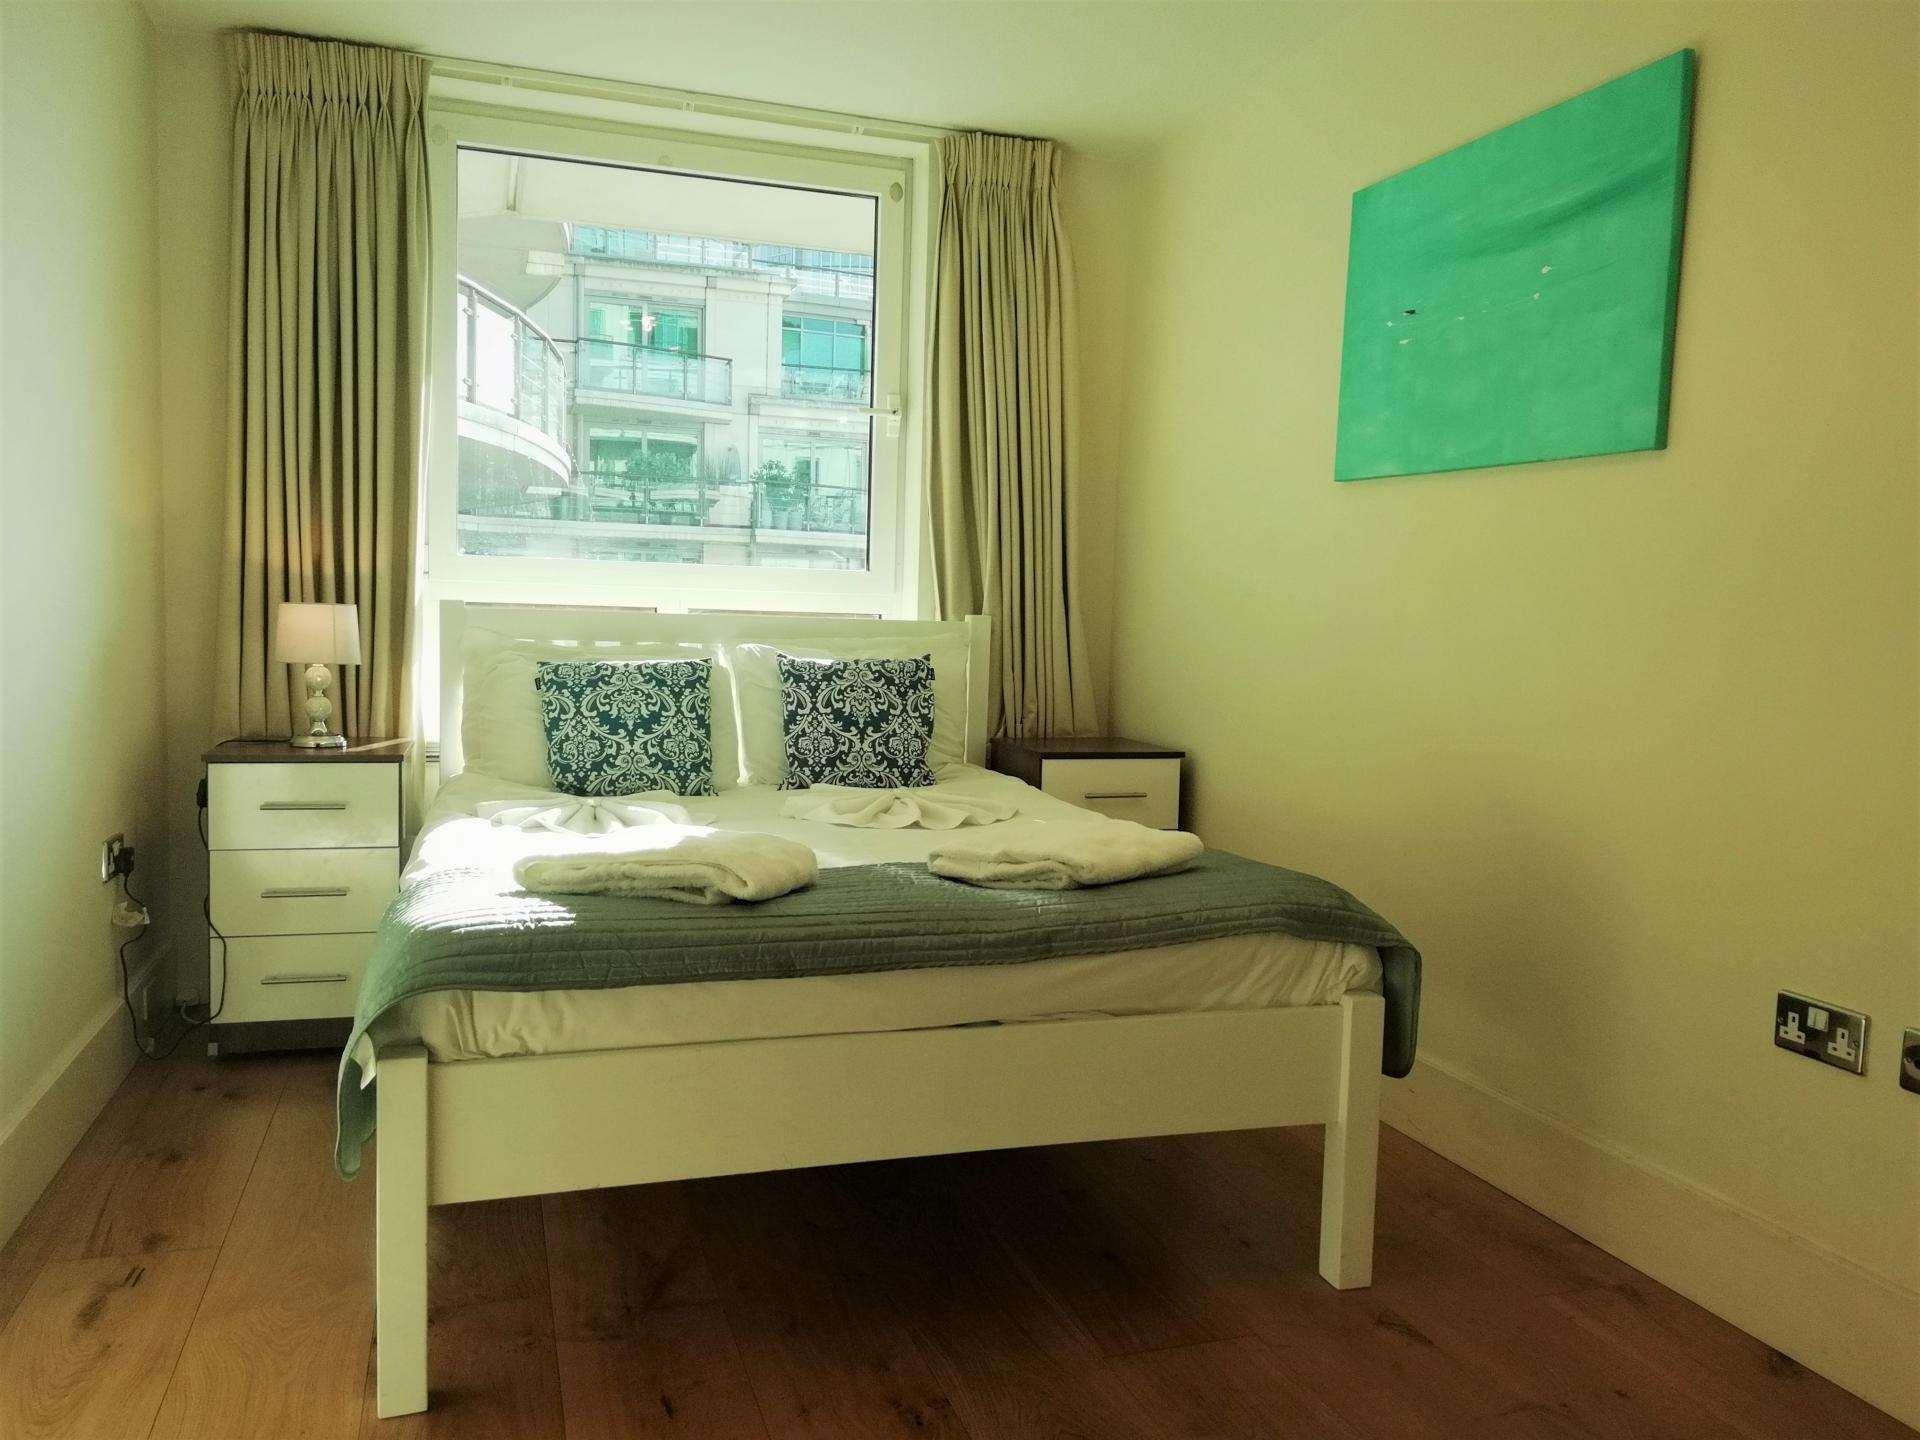 Comfy bed at Still Life Vauxhall, Vauxhall, London - Citybase Apartments